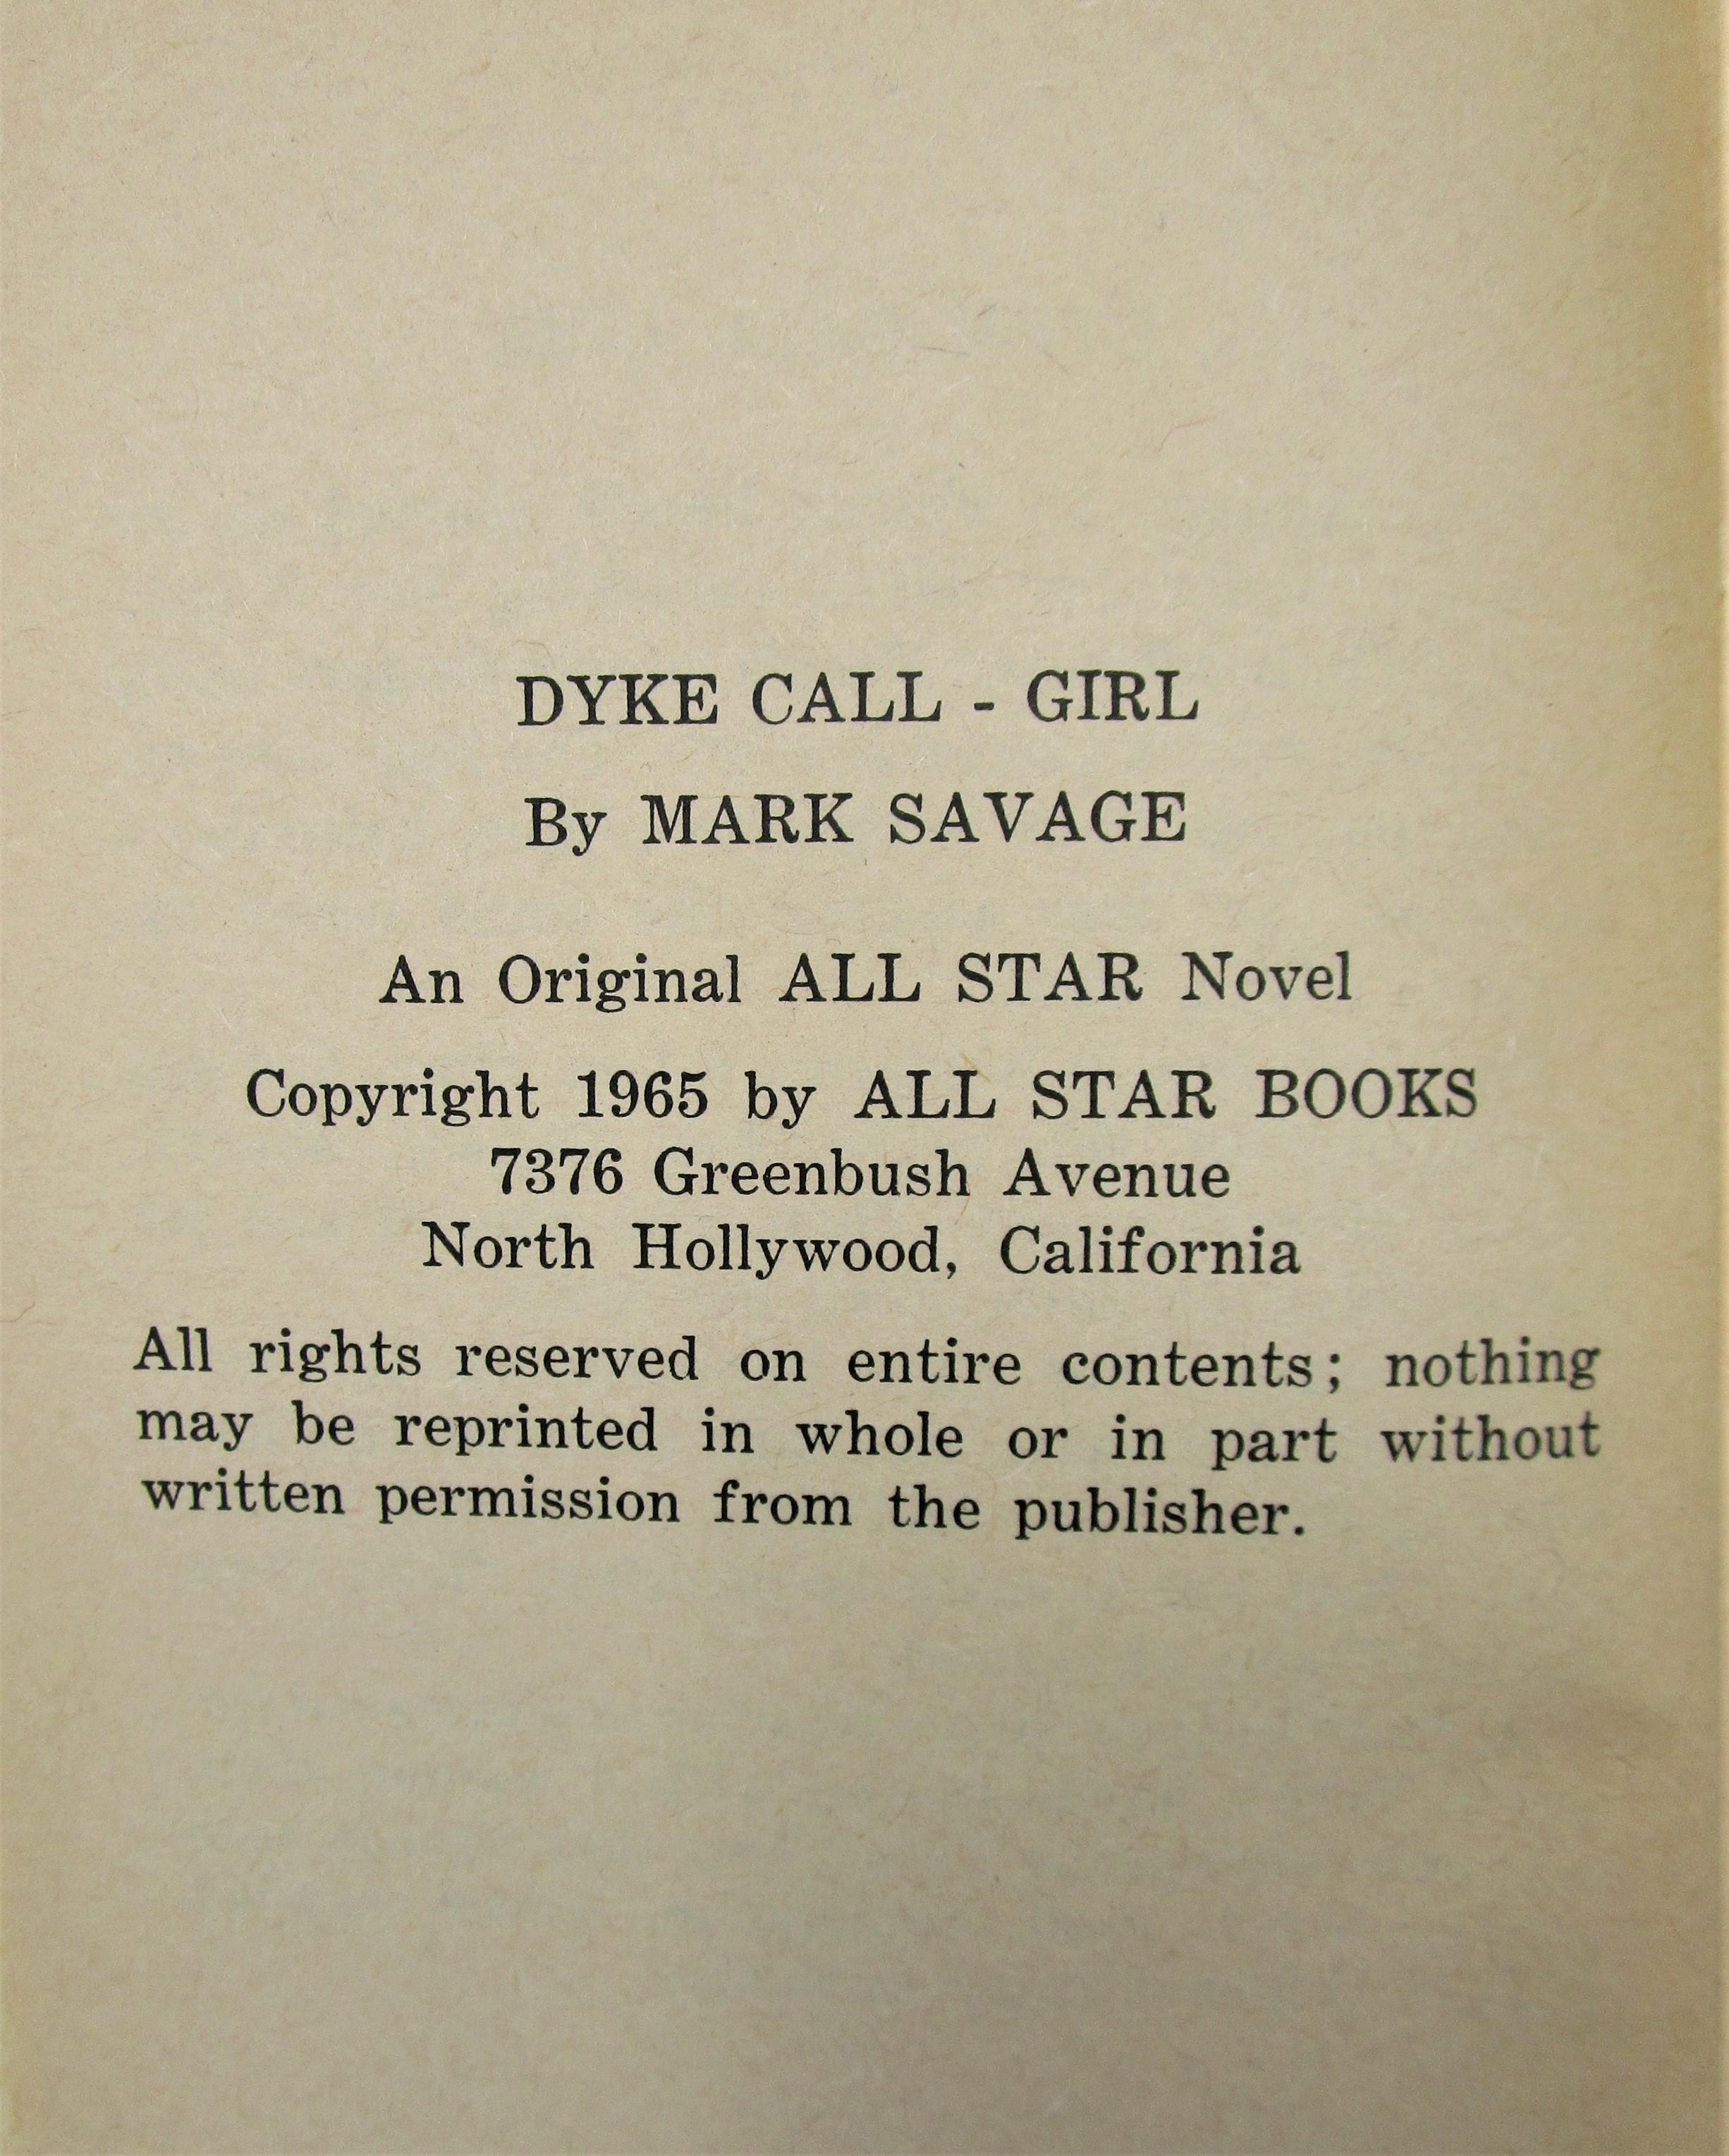 DYKE CALL-GIRL, by Mark Savage - 1965